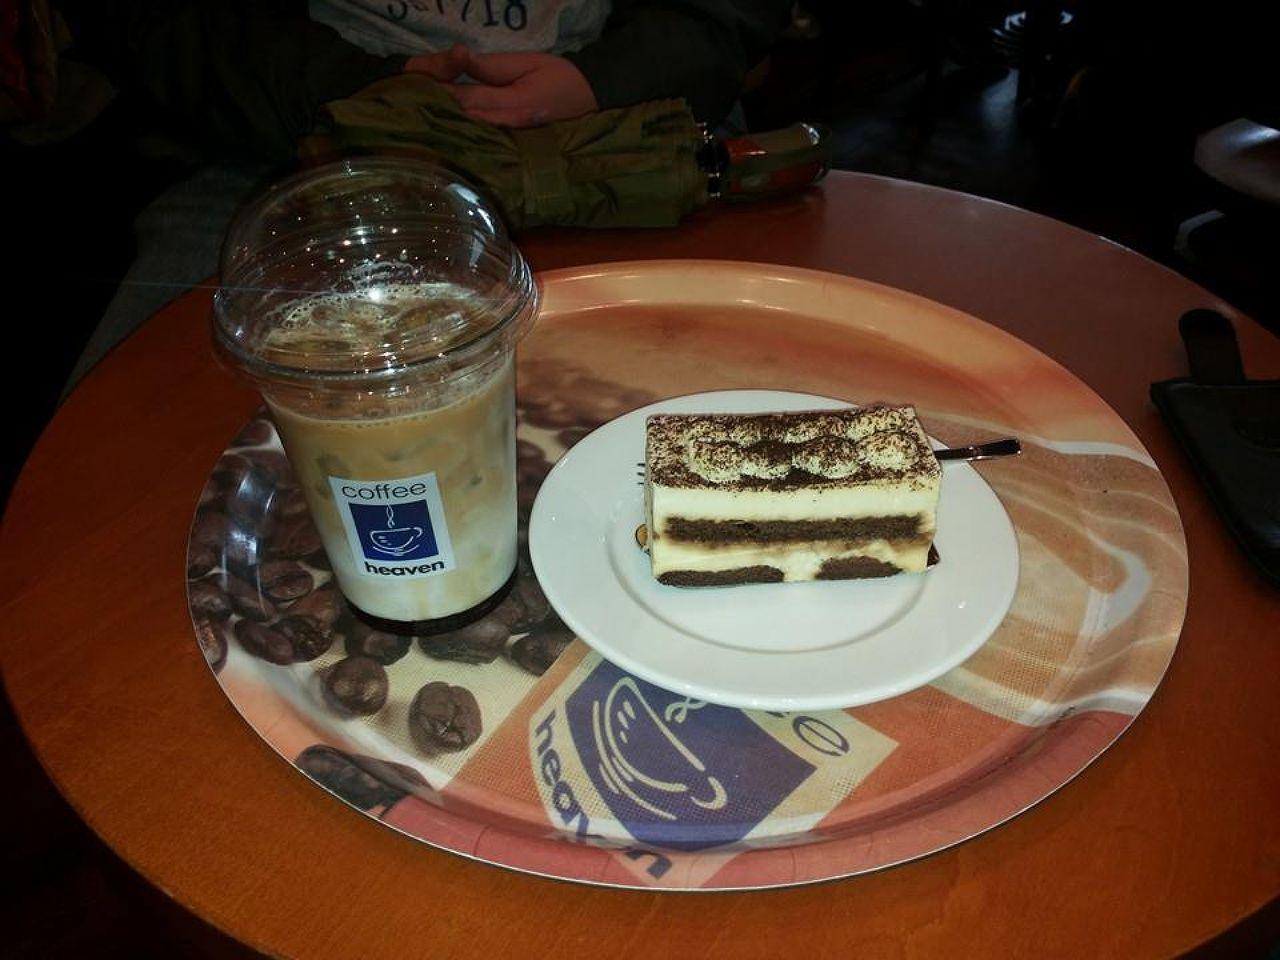 Photo 1 of Coffee Heaven